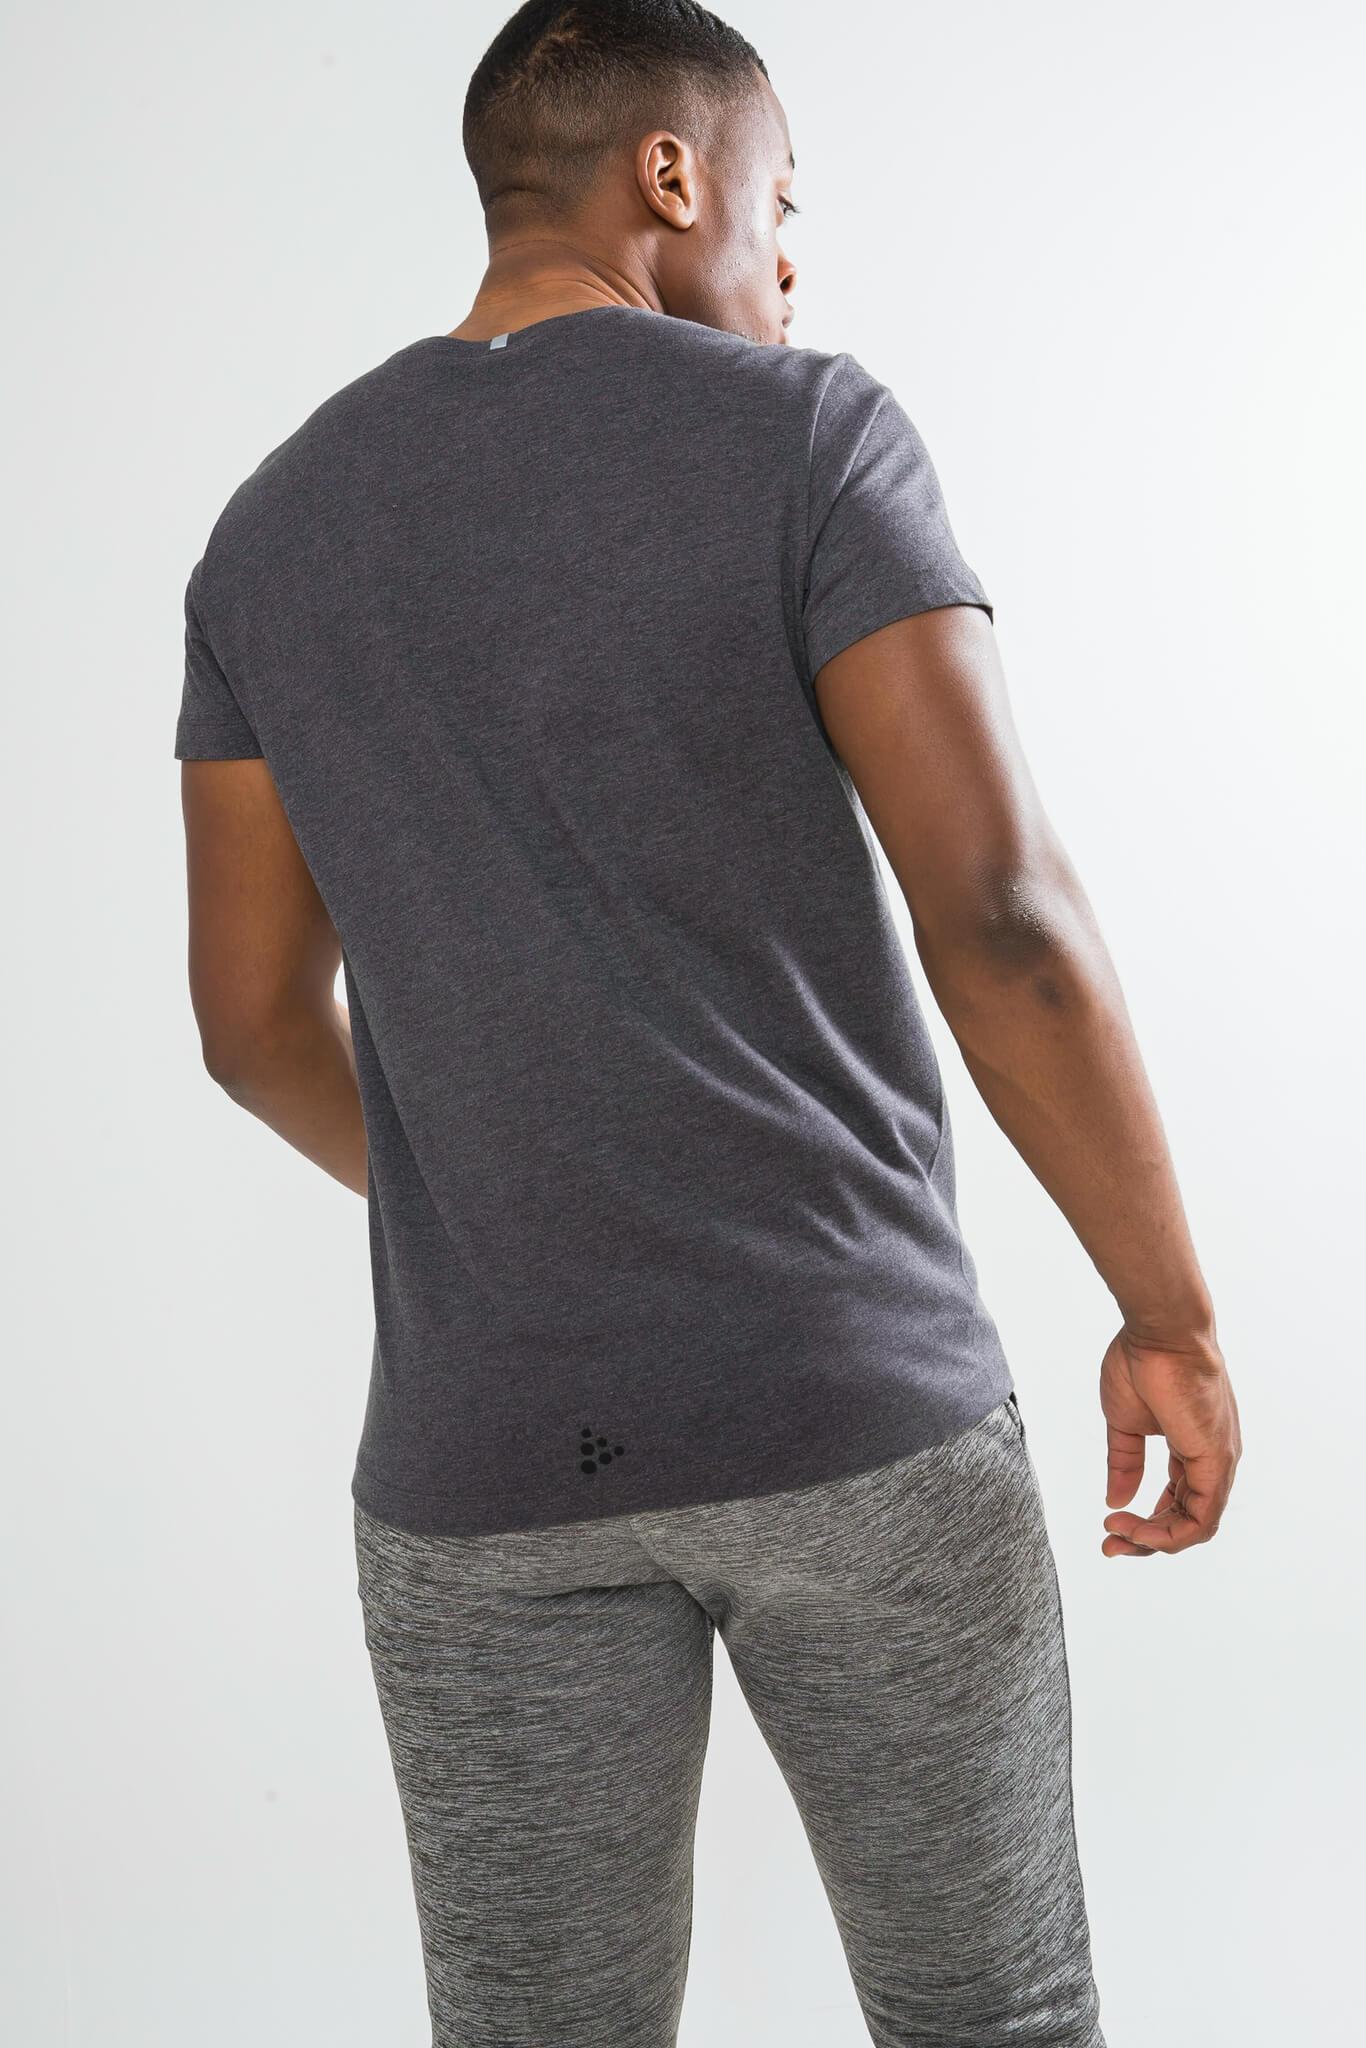 Craft Deft 2.0 футболка мужская dark grey - 3